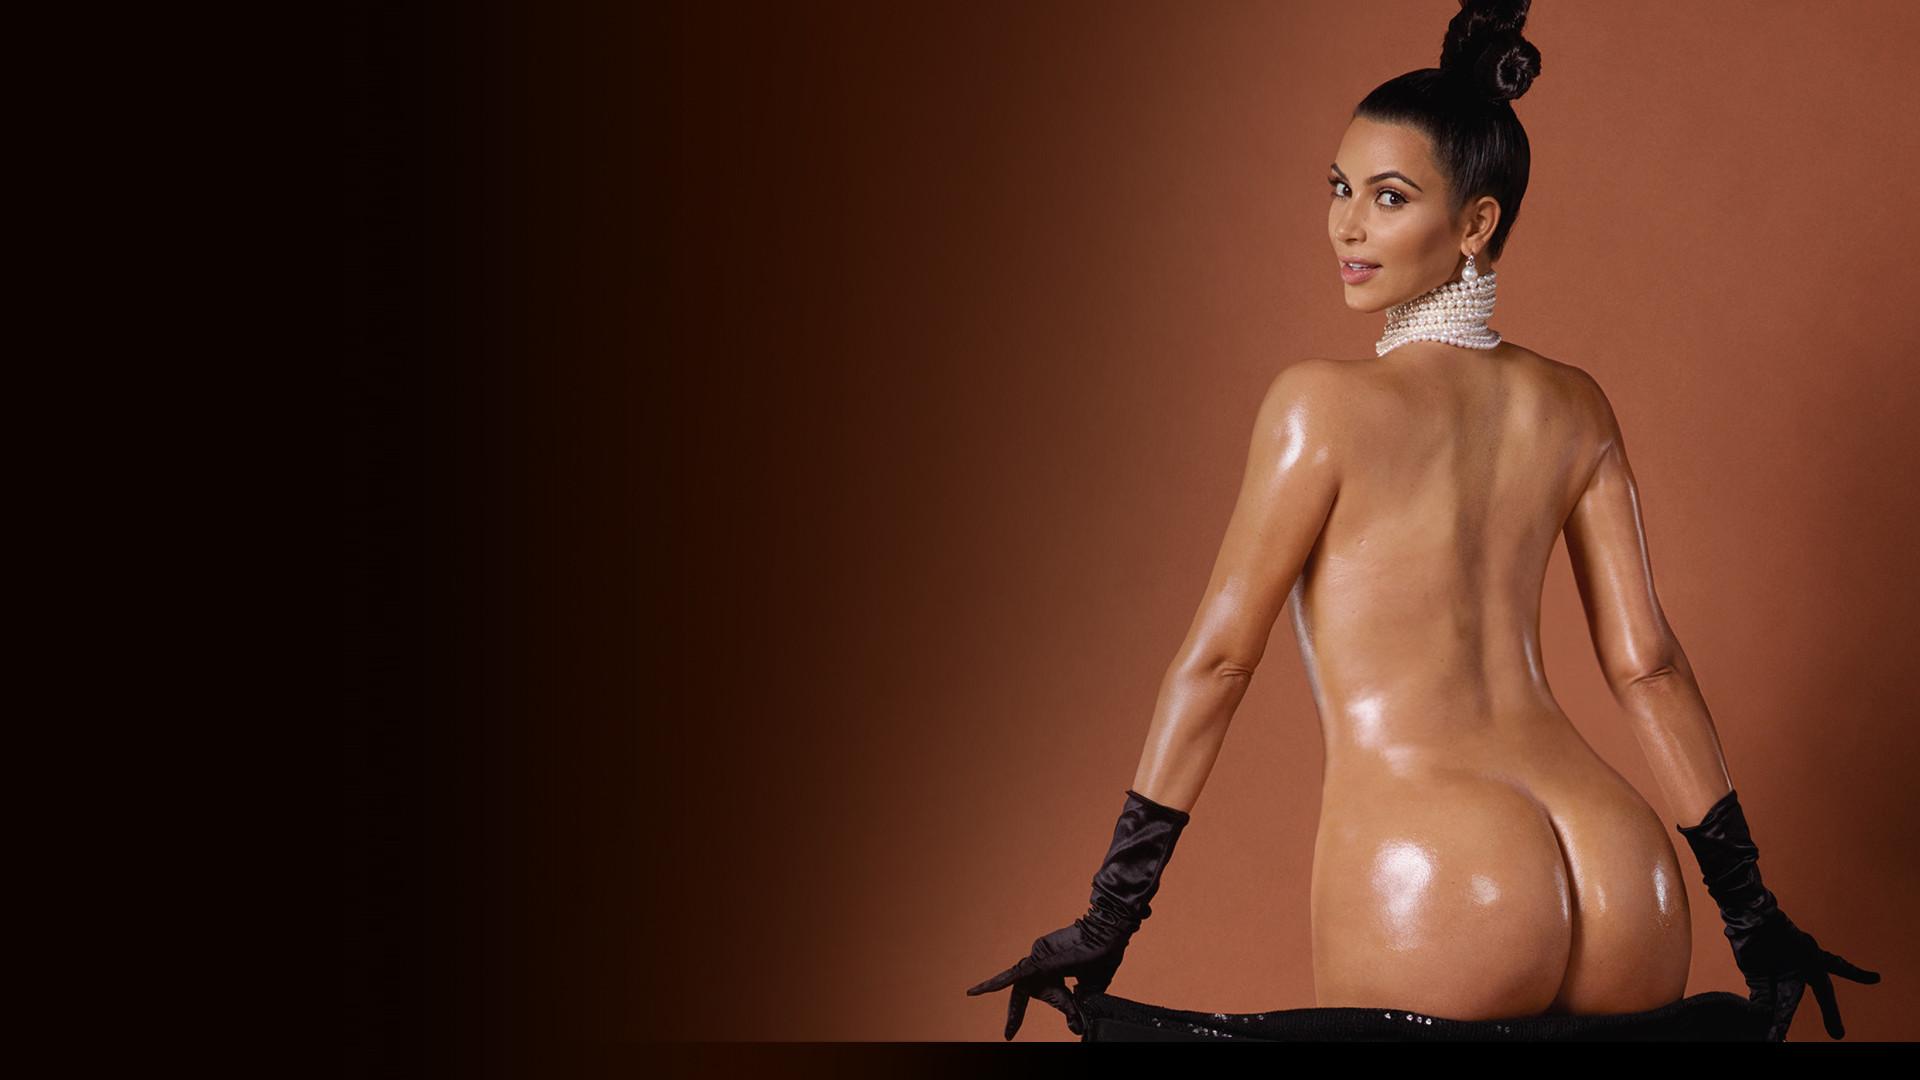 Woman who wants to look like kim kardashian has her botched butt fixed